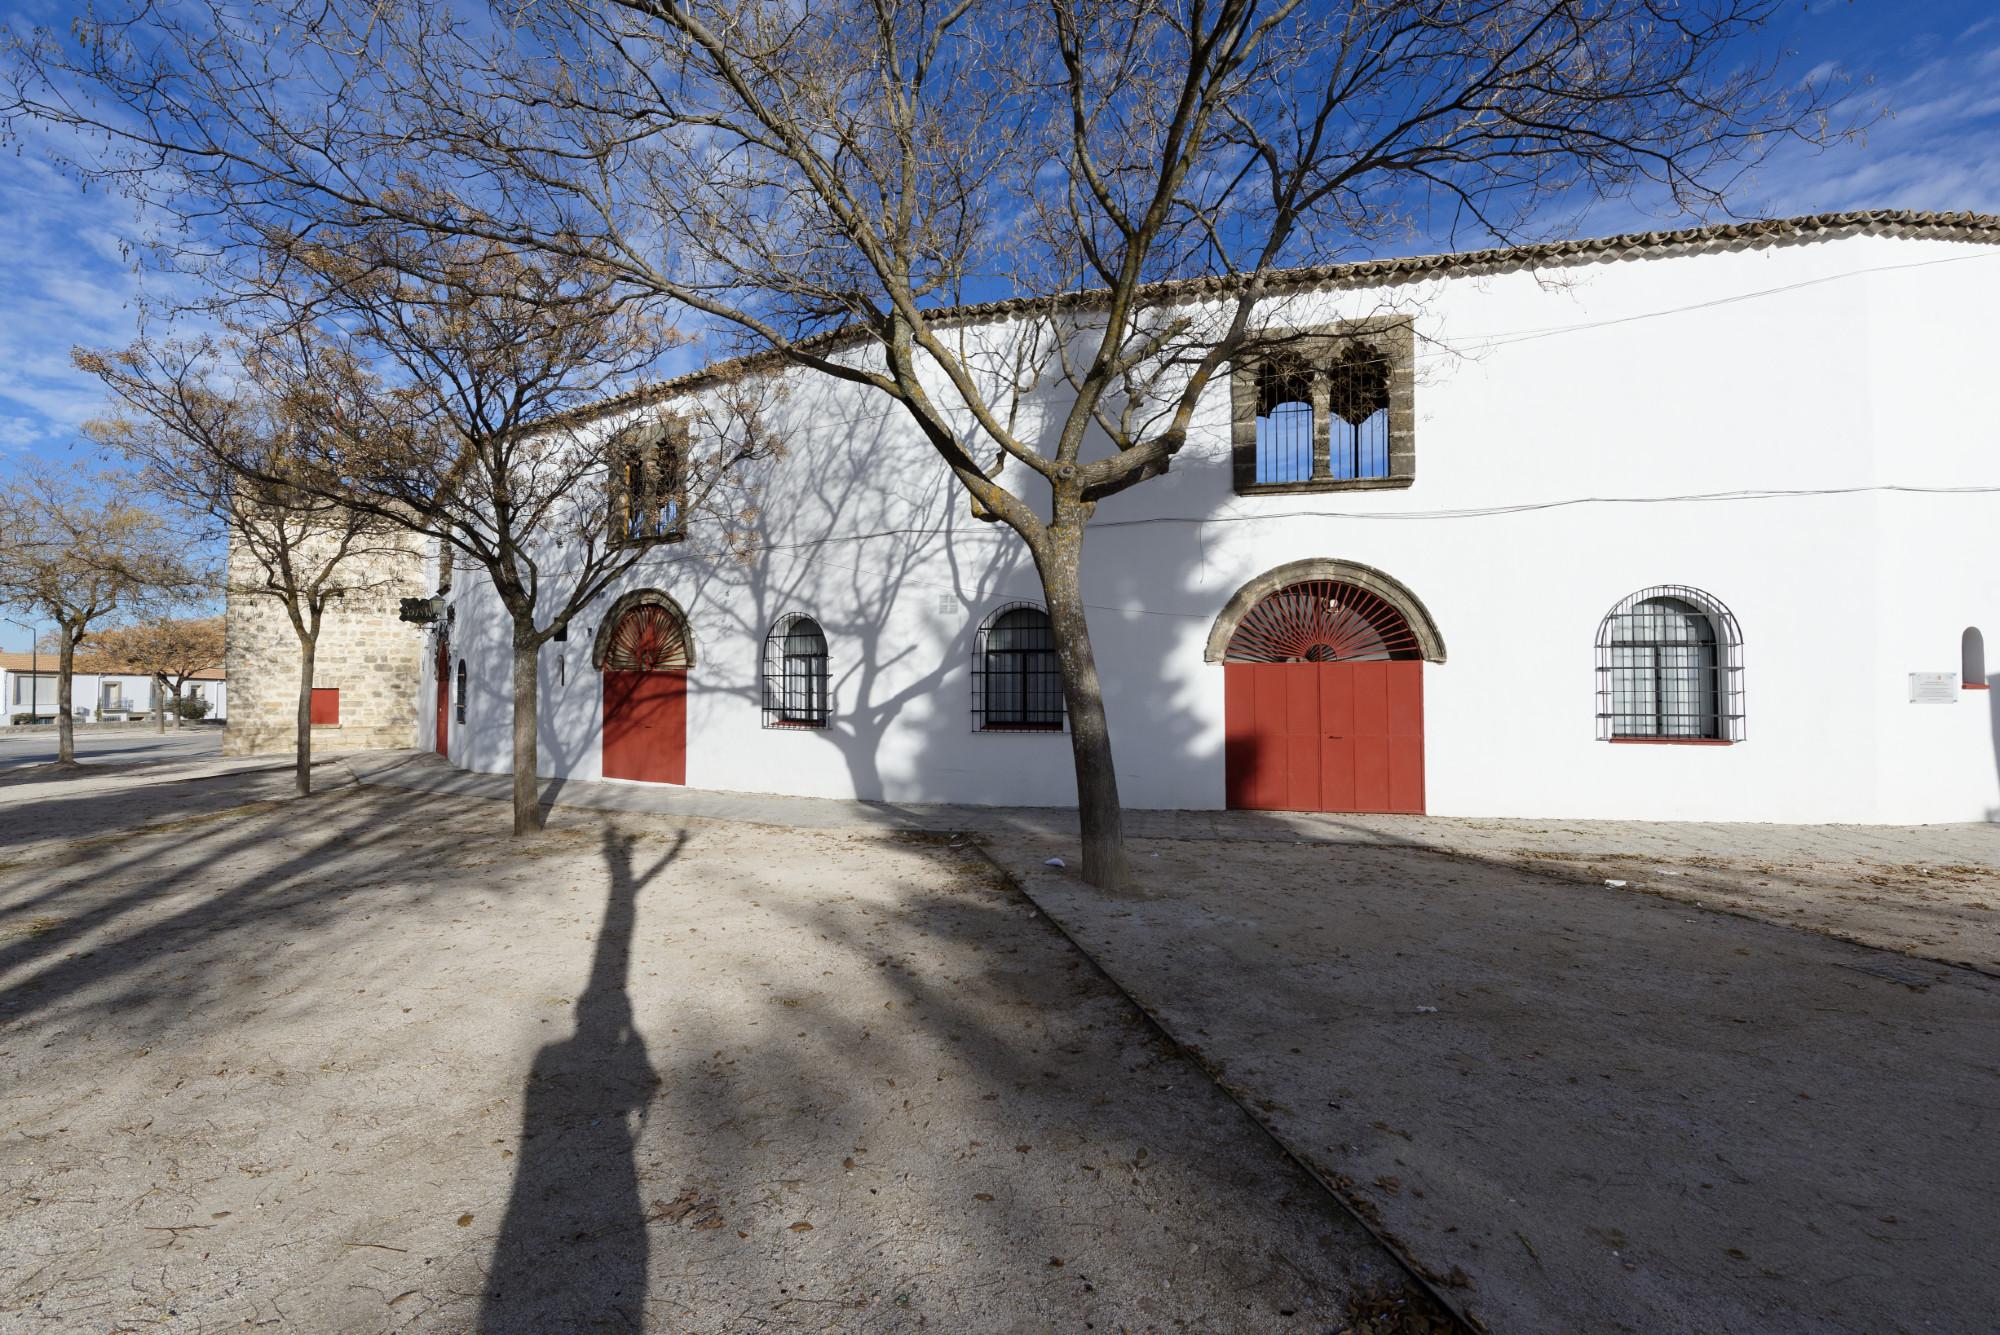 3 Baeza (Andalousie) (47)